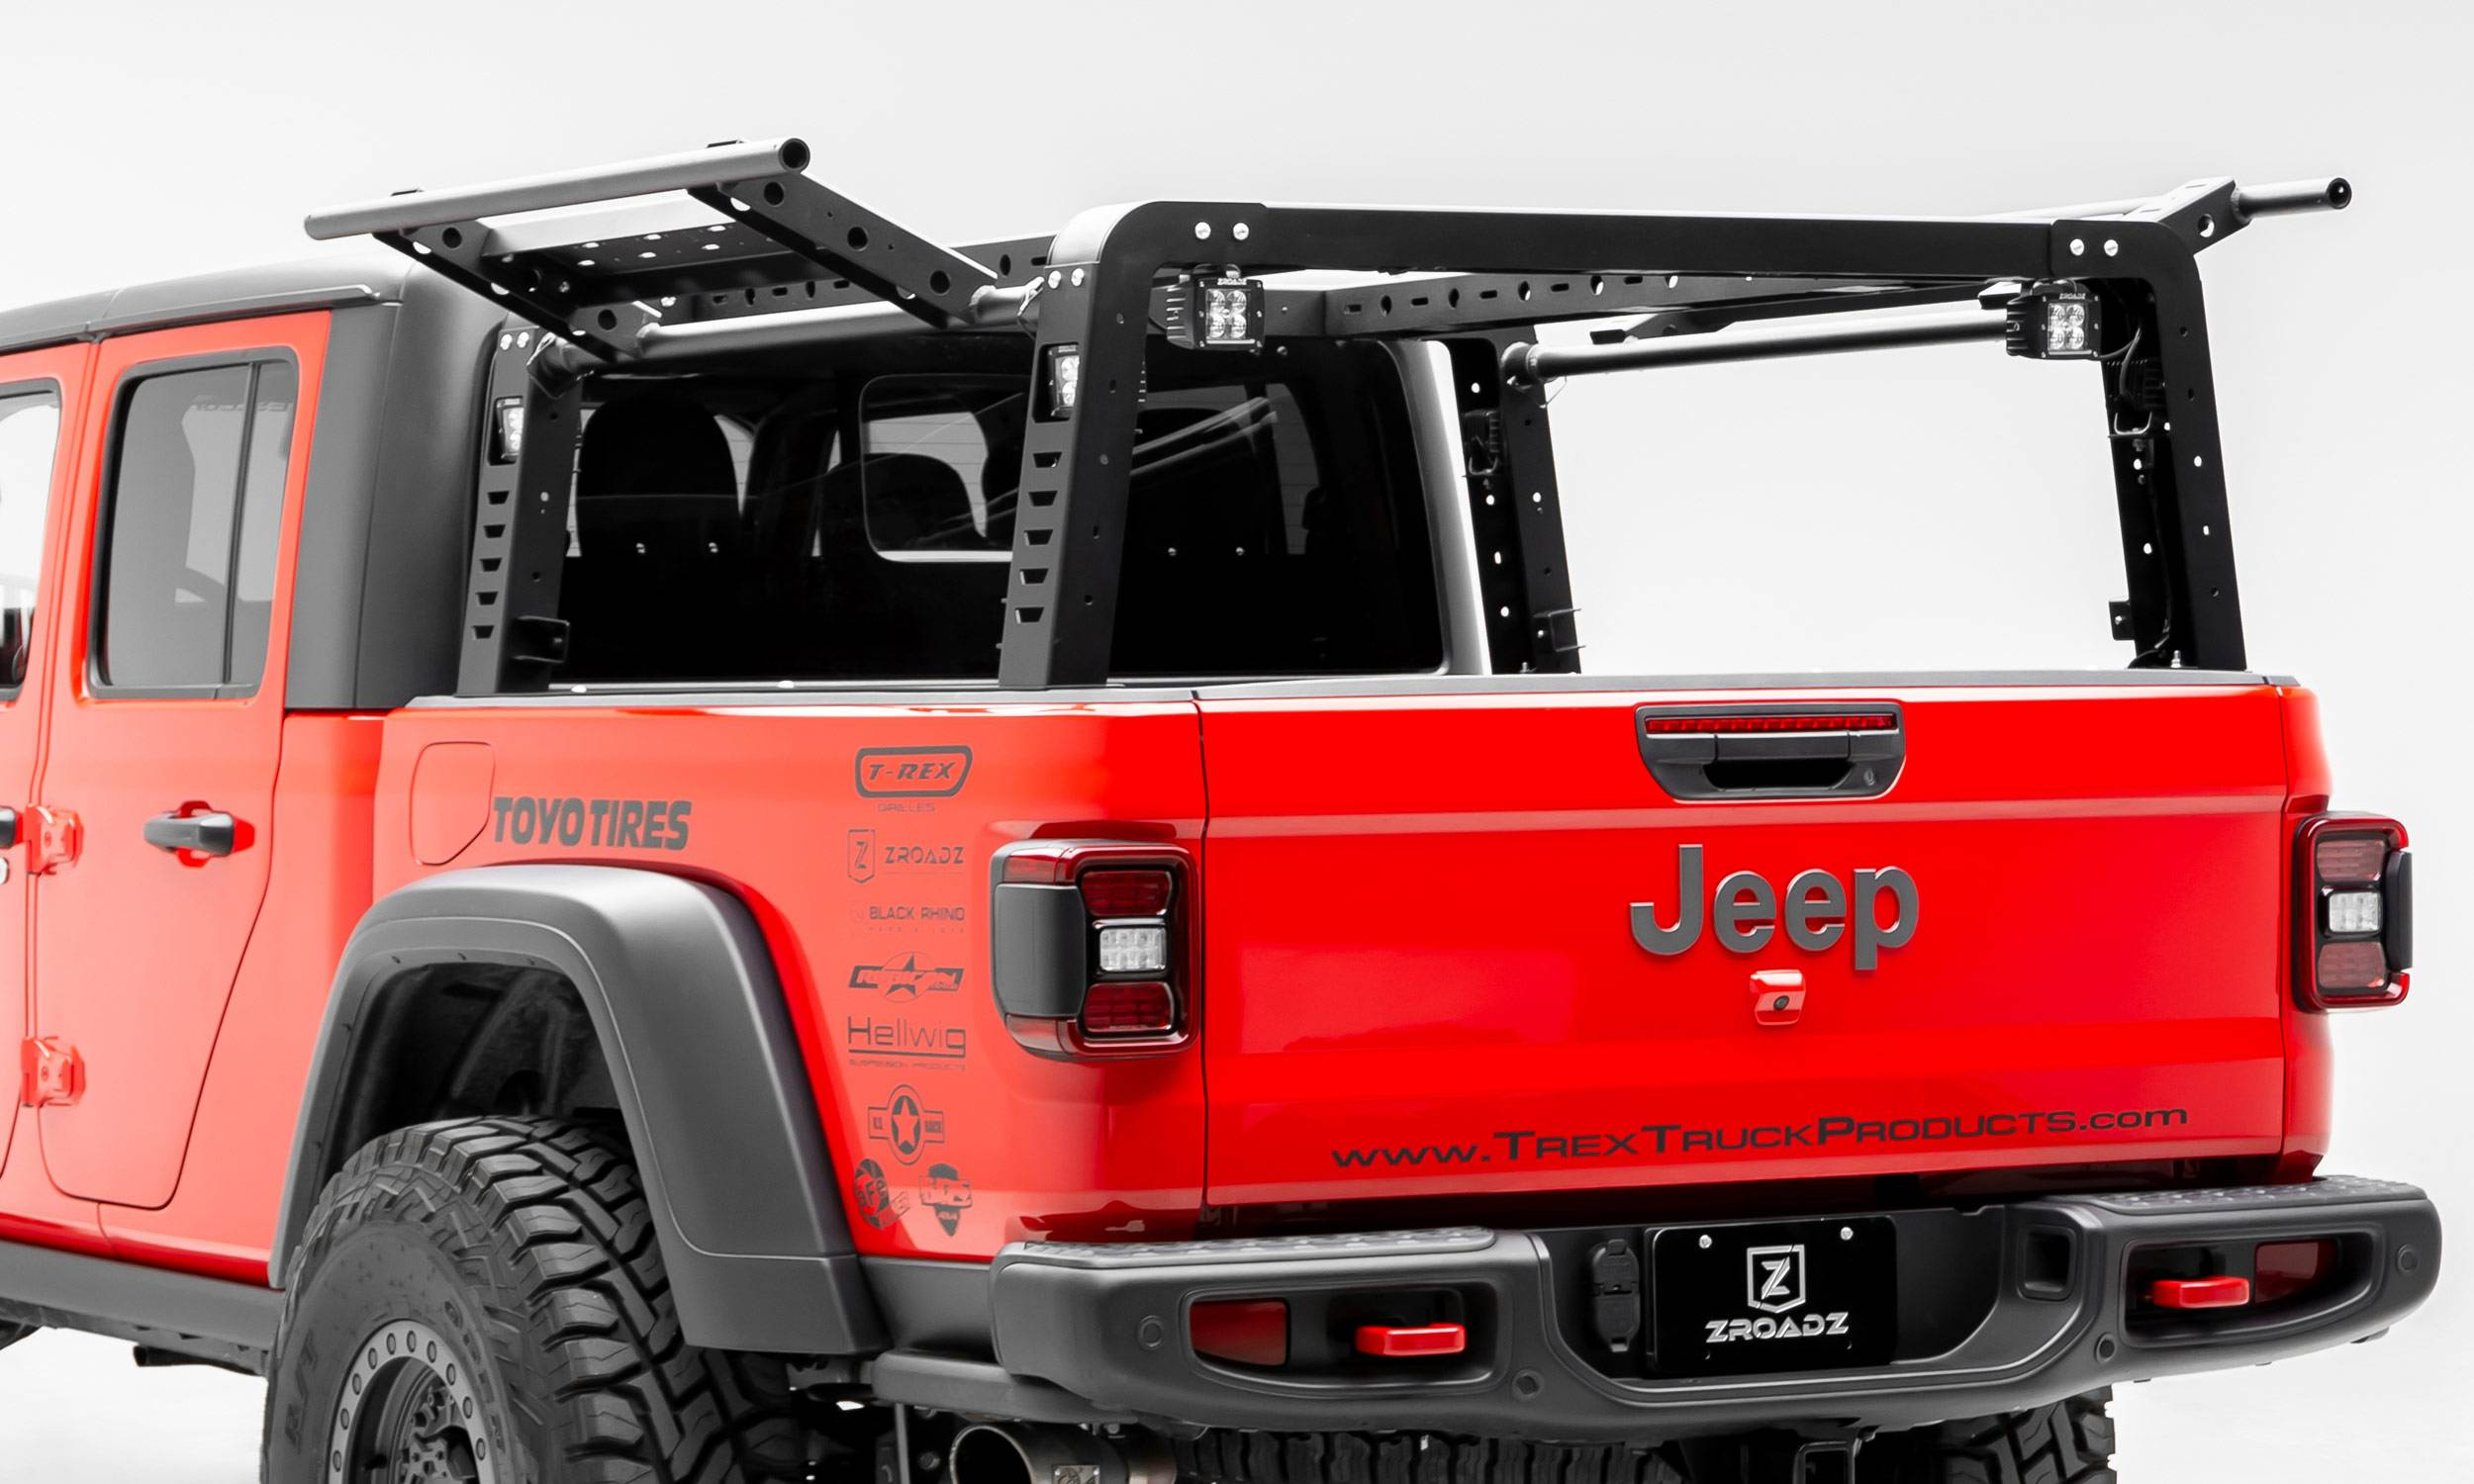 2019-2020 Jeep Gladiator Overland Access Rack With Side Gates, Incl. (4) 3 Inch ZROADZ LED Pod Lights - PN #Z834101